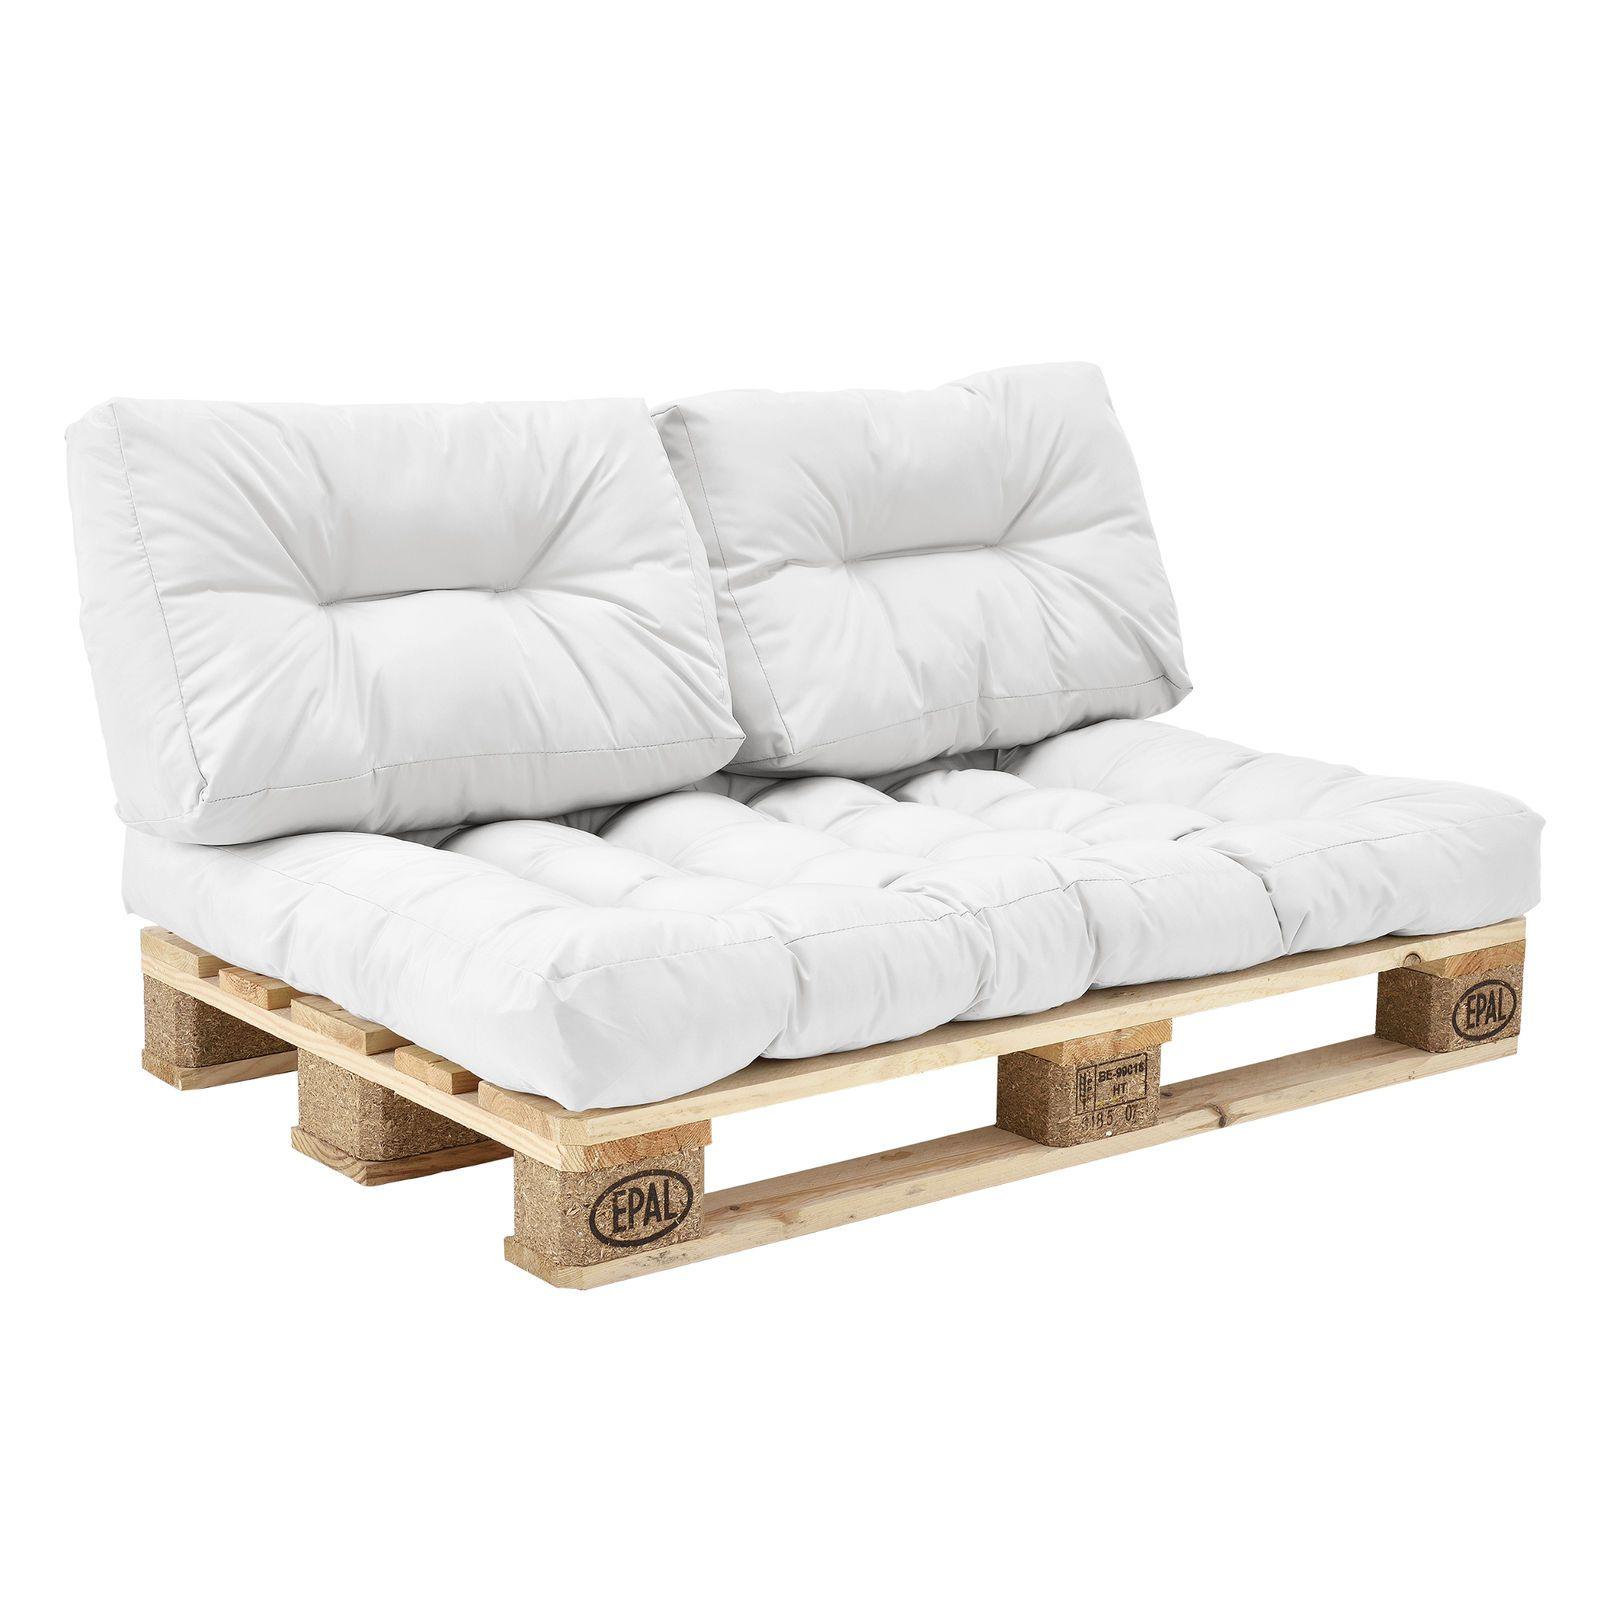 casa euro palets sof 3x asiento almohadas para la espalda blanco eur 8068 encasa euro palets sof 3x asiento almohadas para la espalda - Europalets